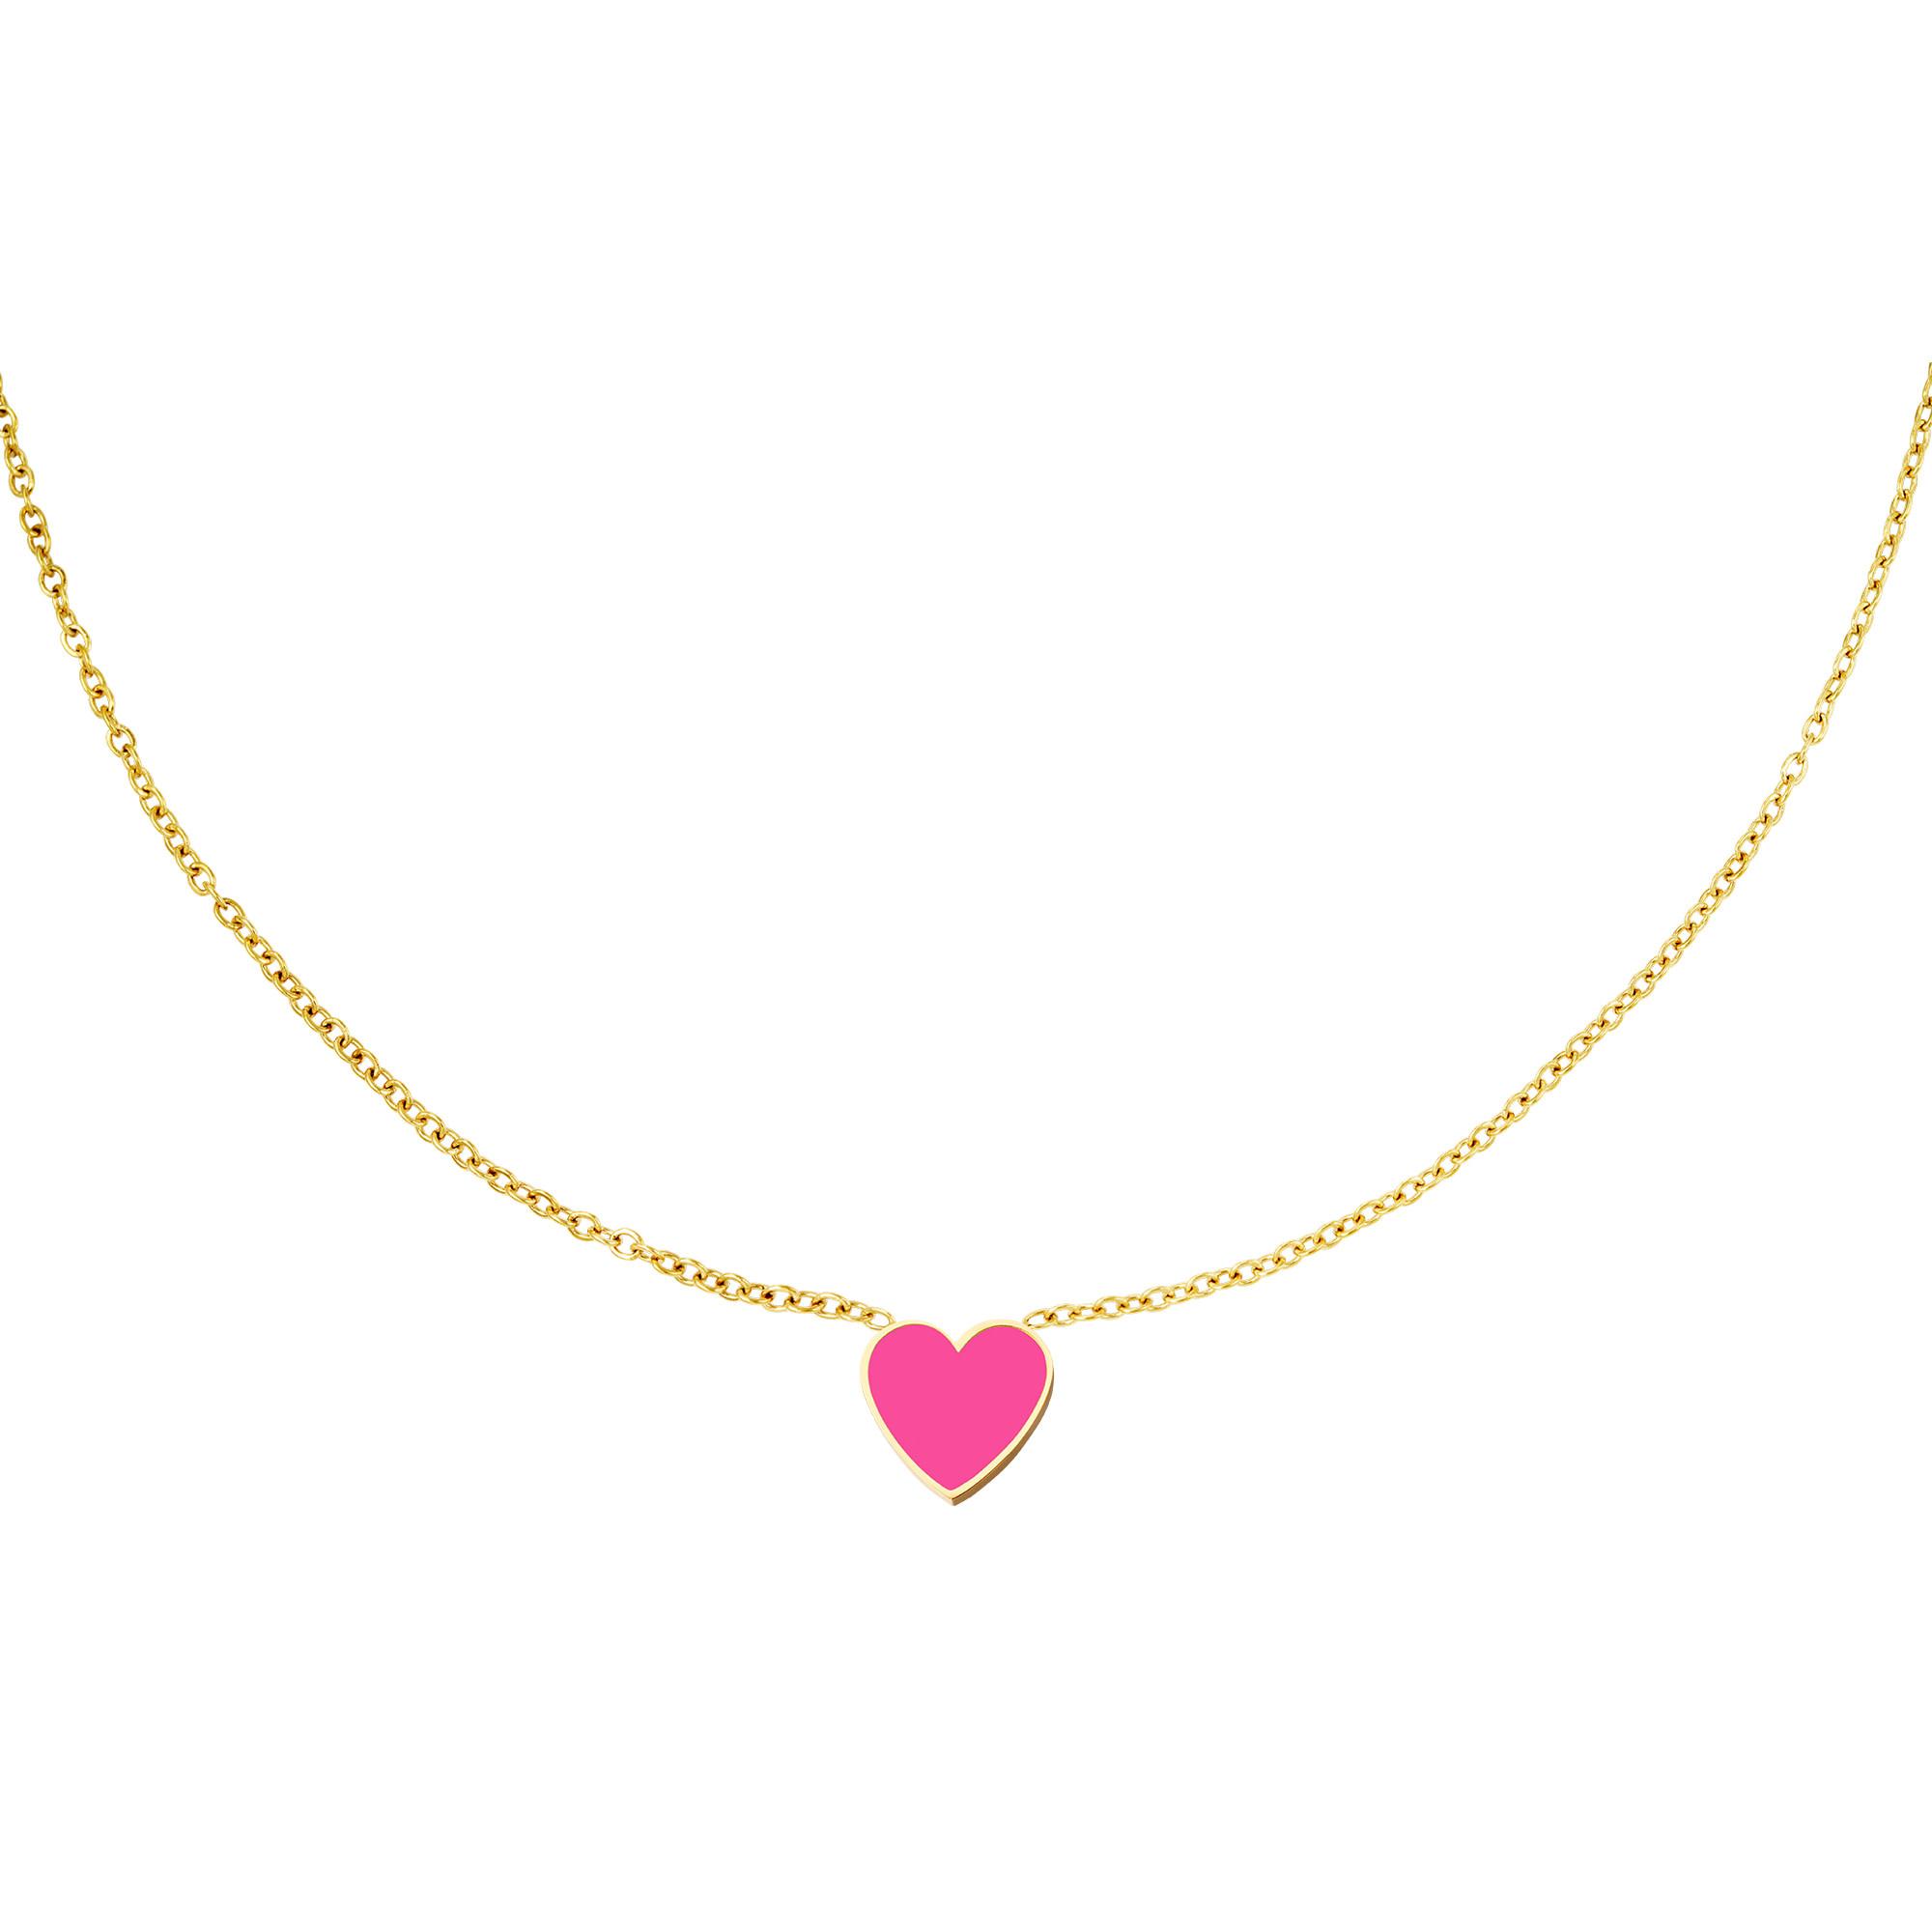 With love Necklace heart fushia